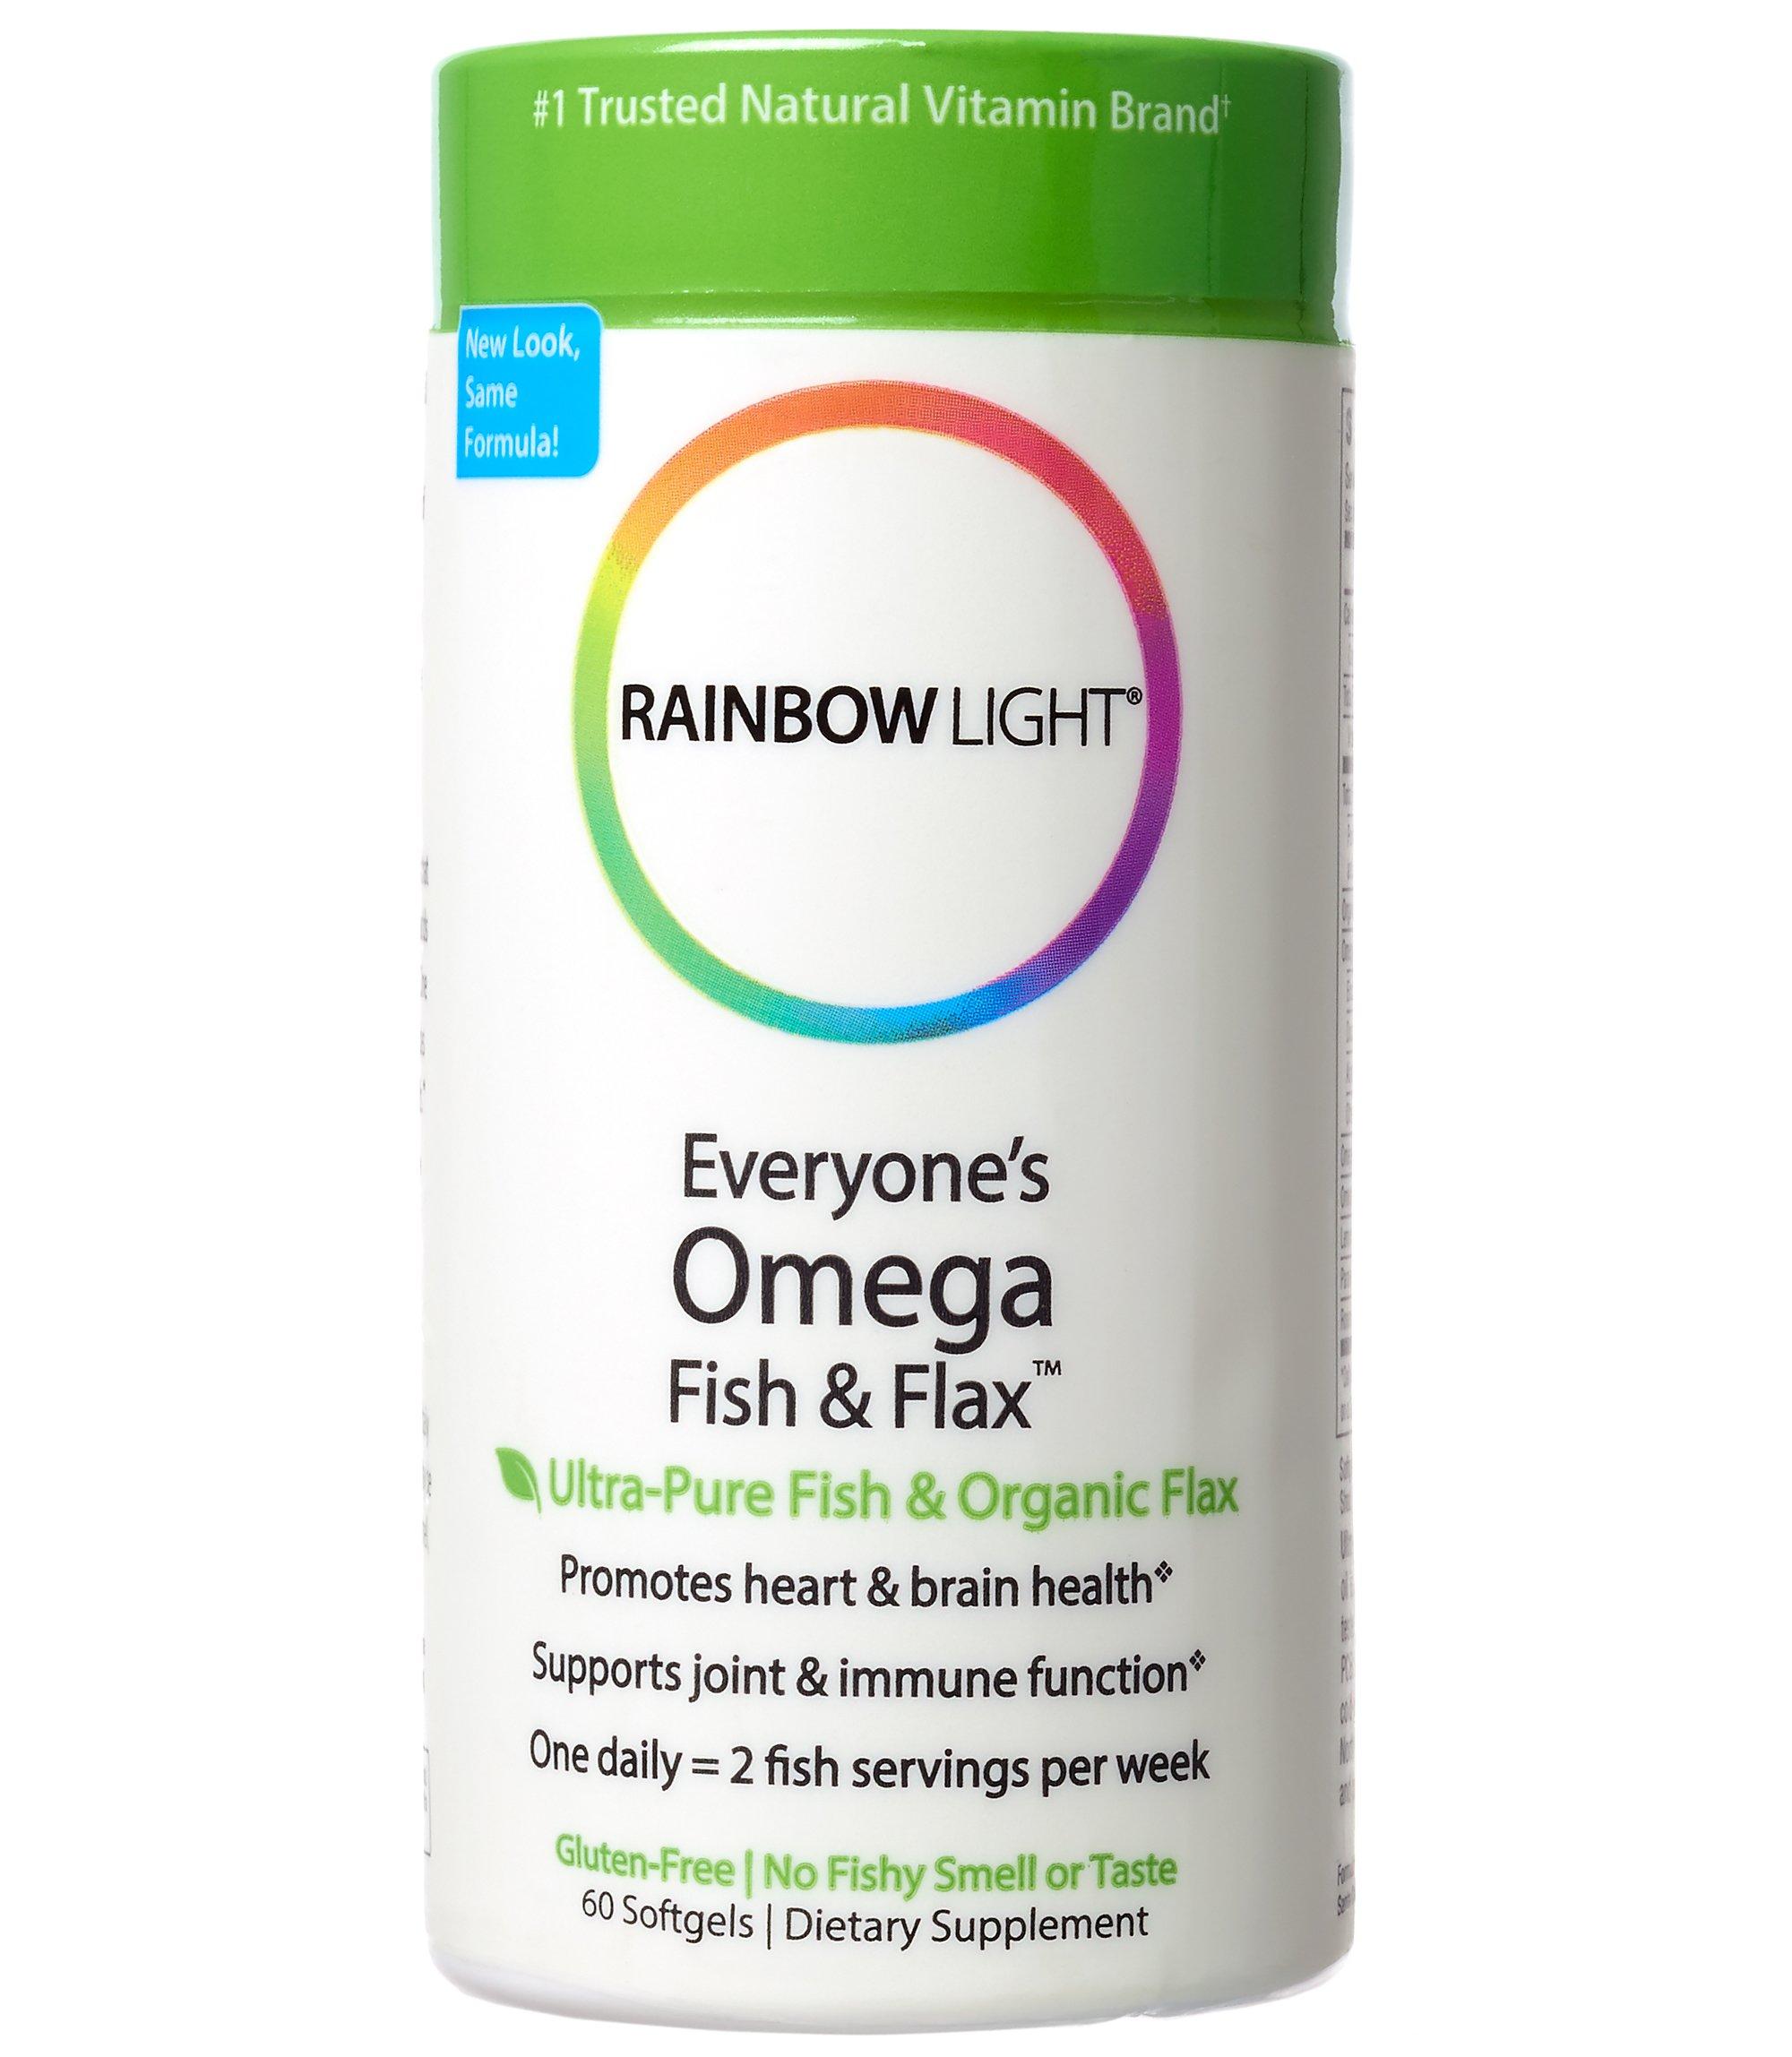 Rainbow Light - Everyone's Omega Fish & Flax, 60 Softgels